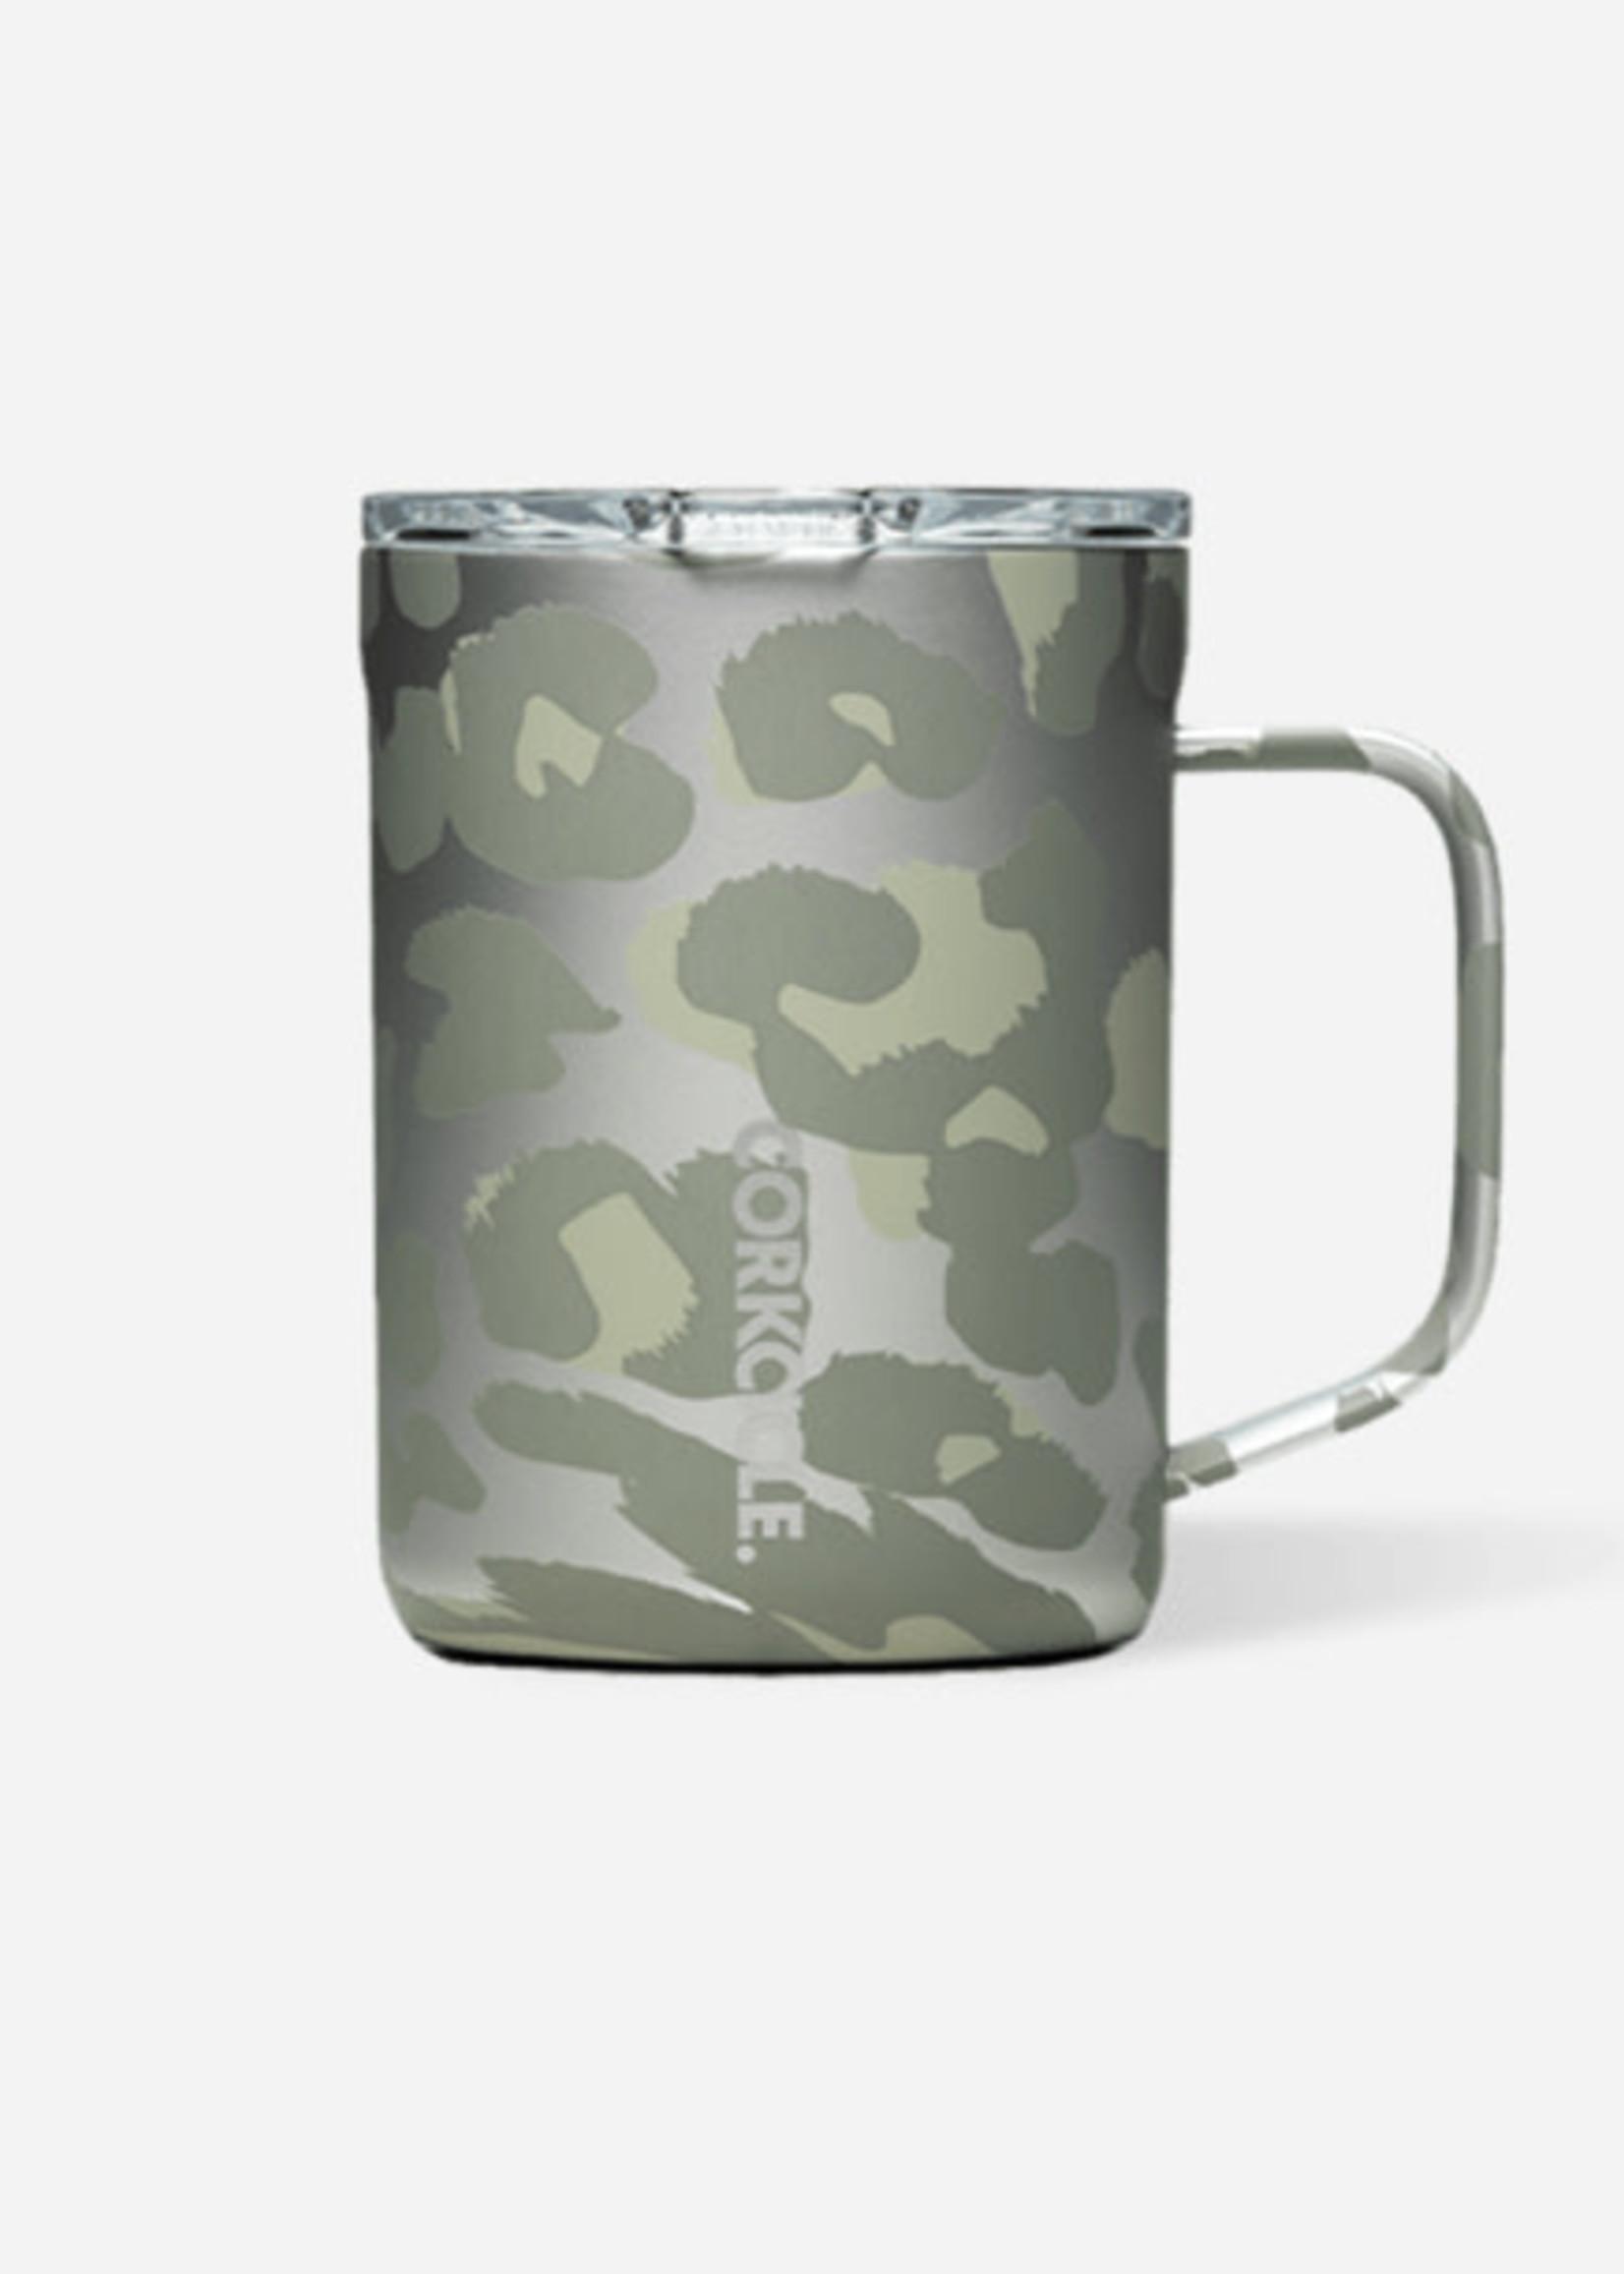 Corkcicle Corkcicle Mug 16oz - Snow Leopard